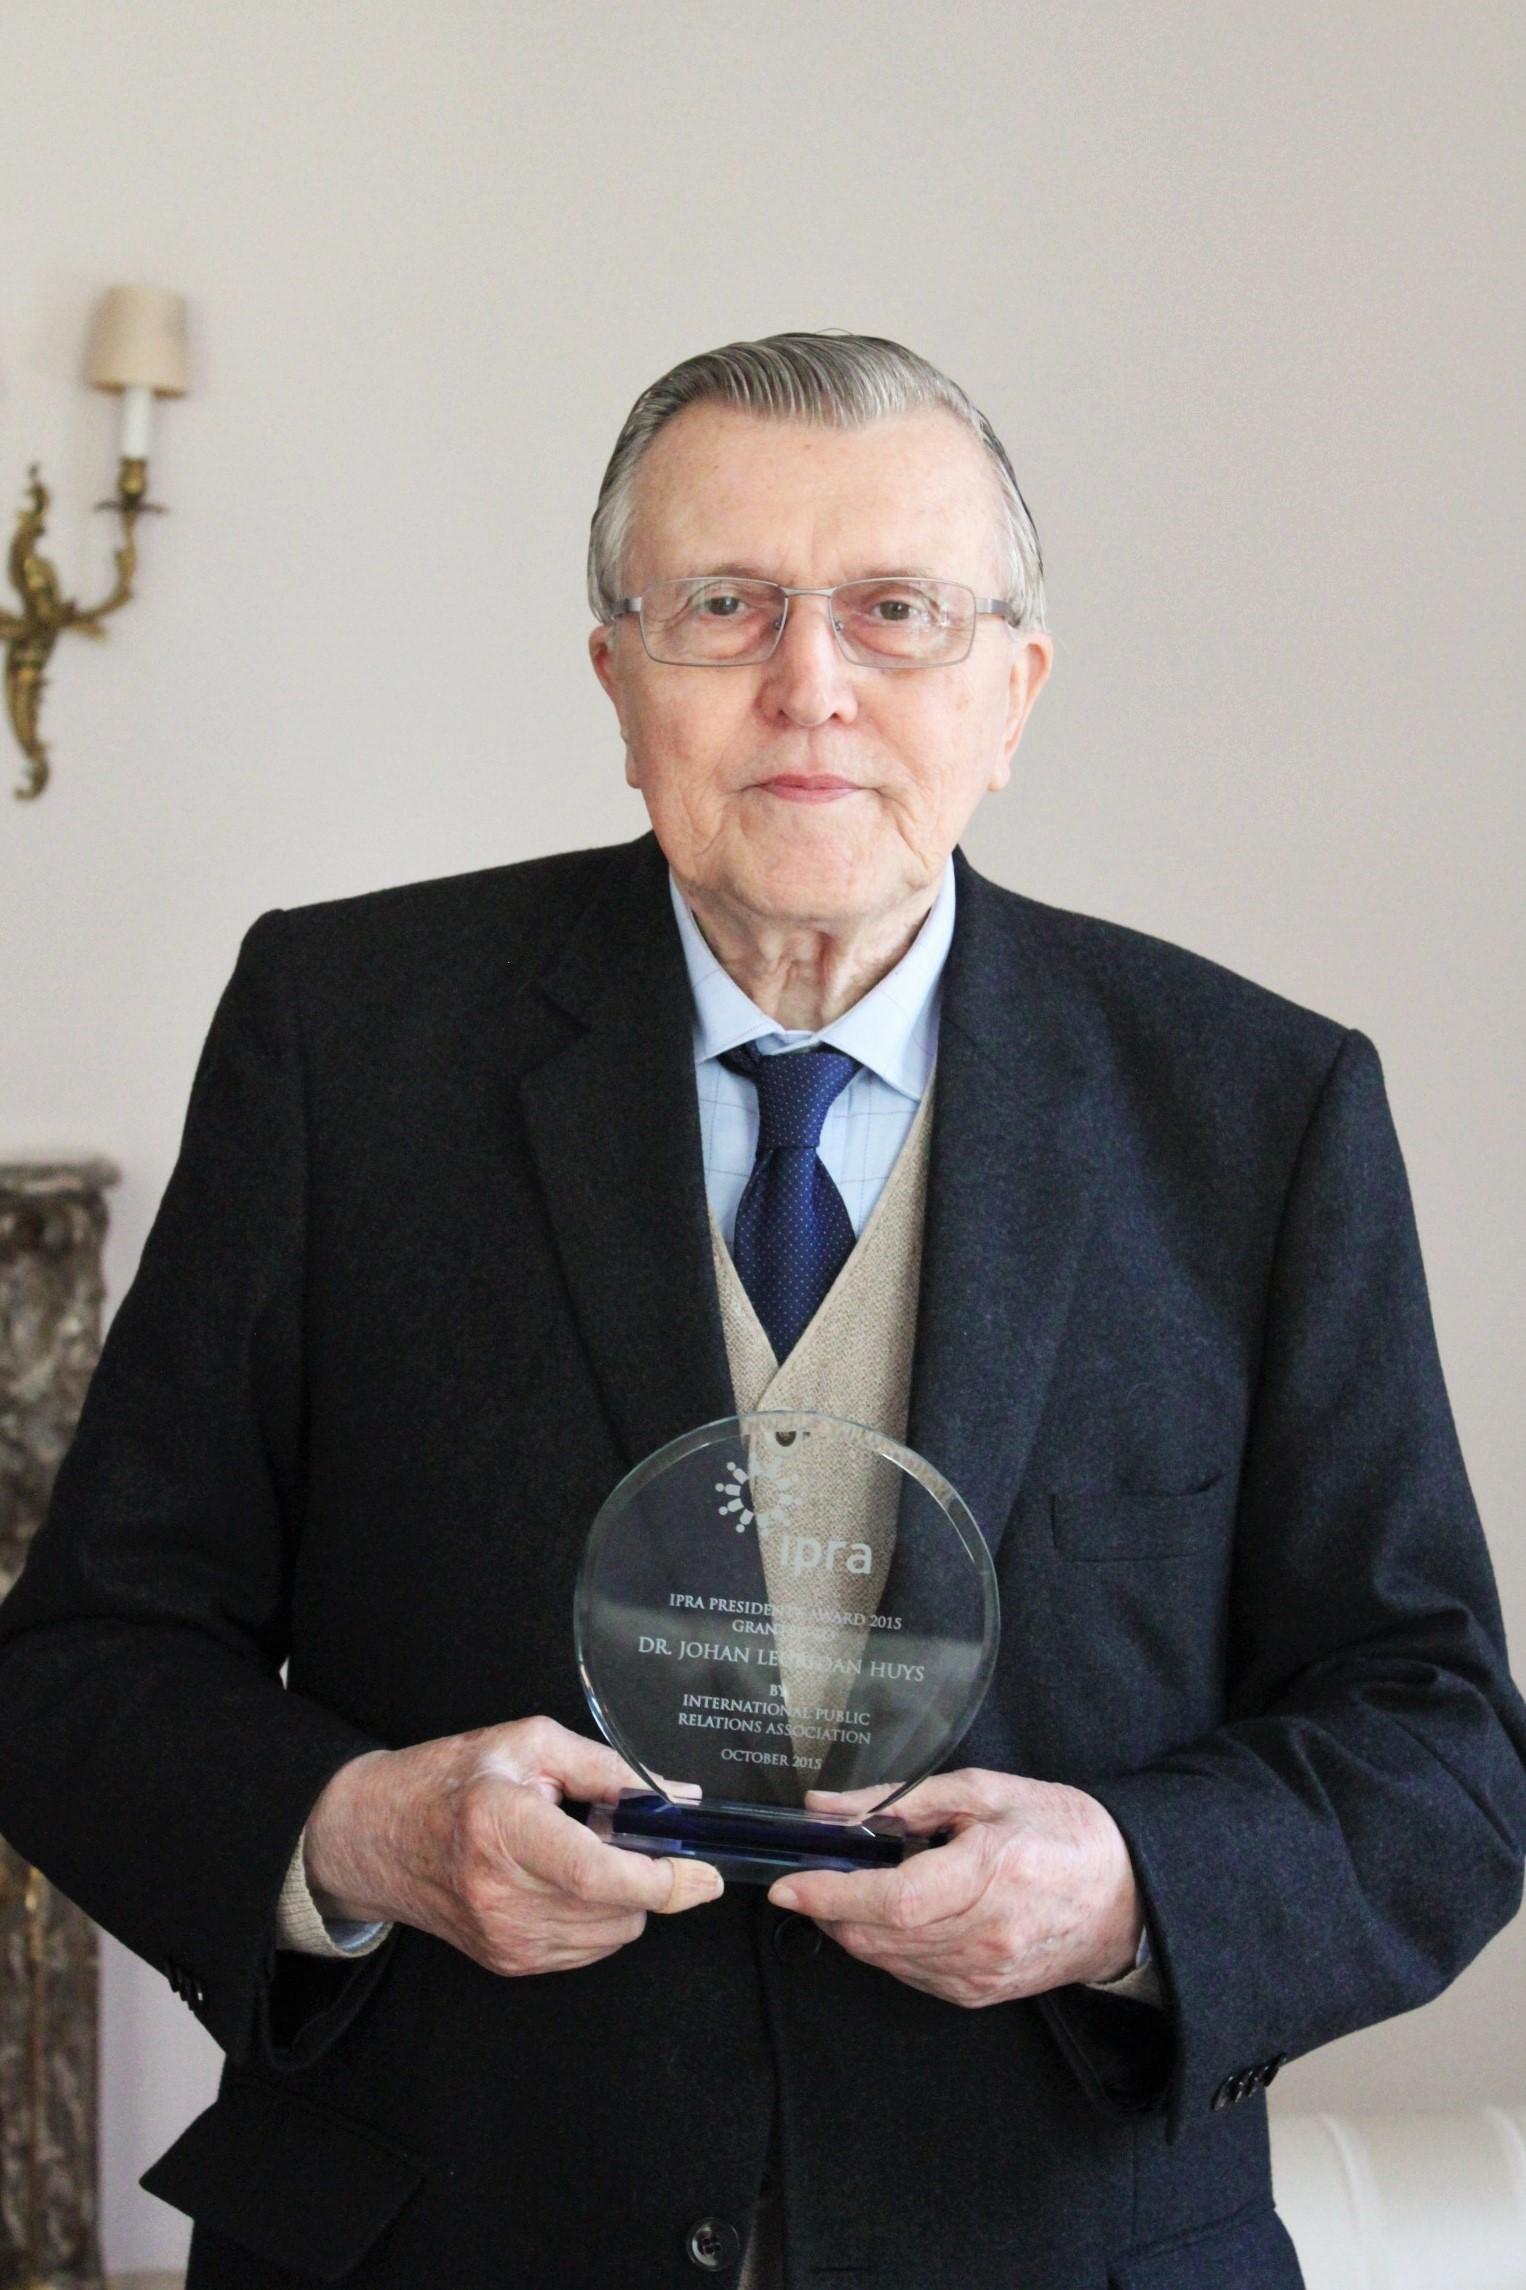 DR. JOHAN LEURIDAN HUYS